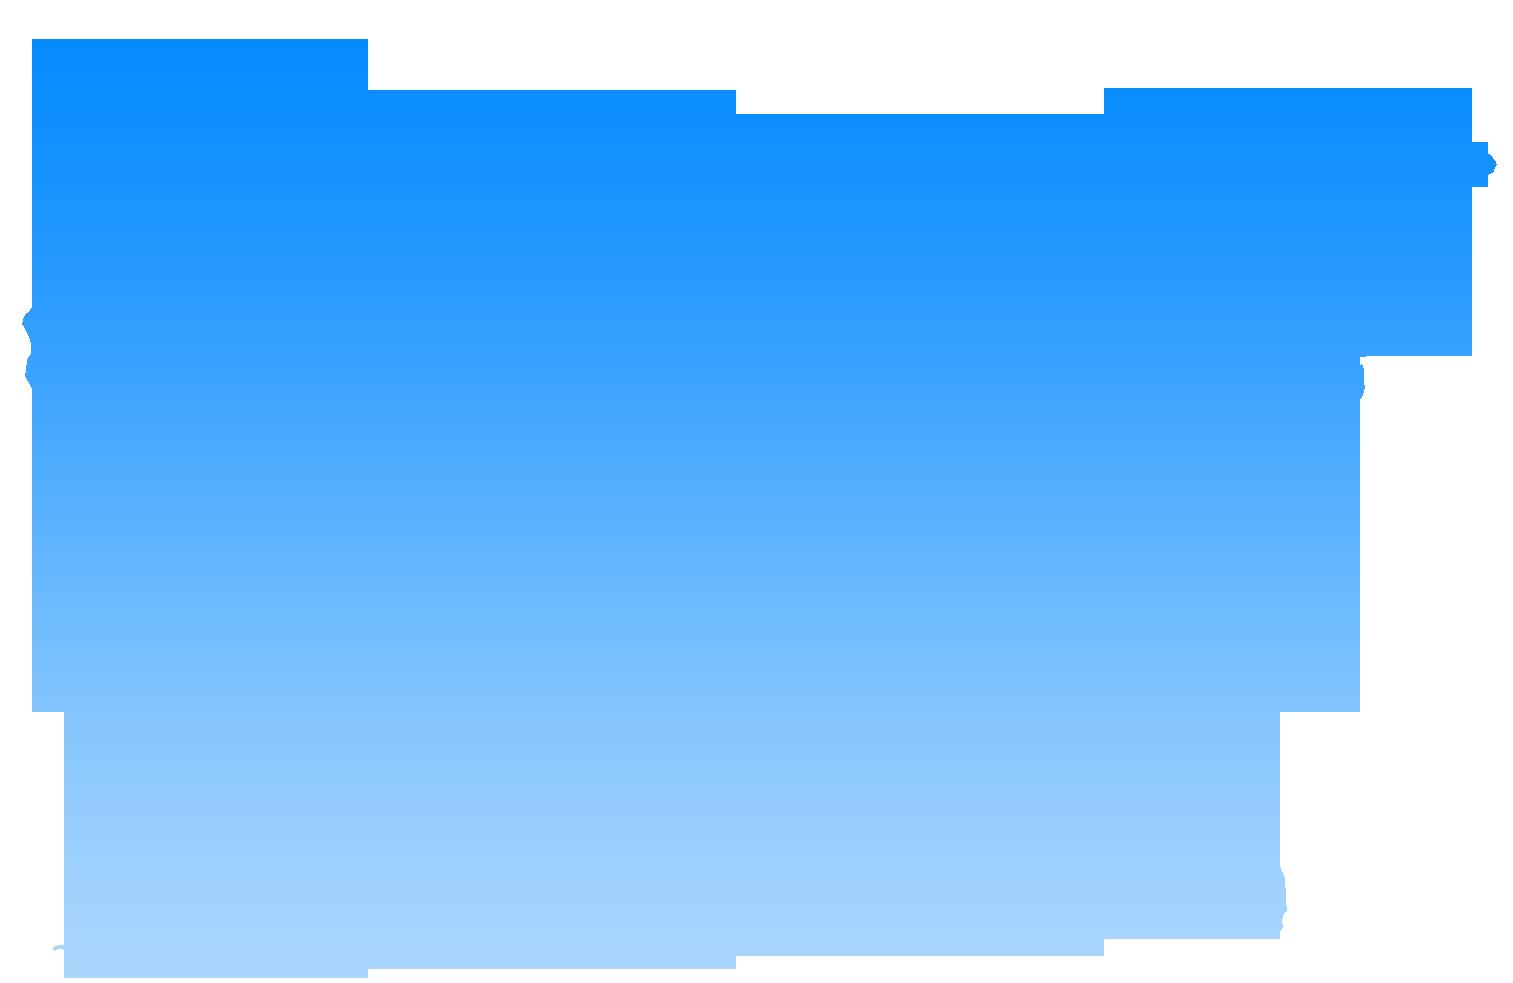 usa map hd wallpaper wallpapersafari map united states cities map us map png united